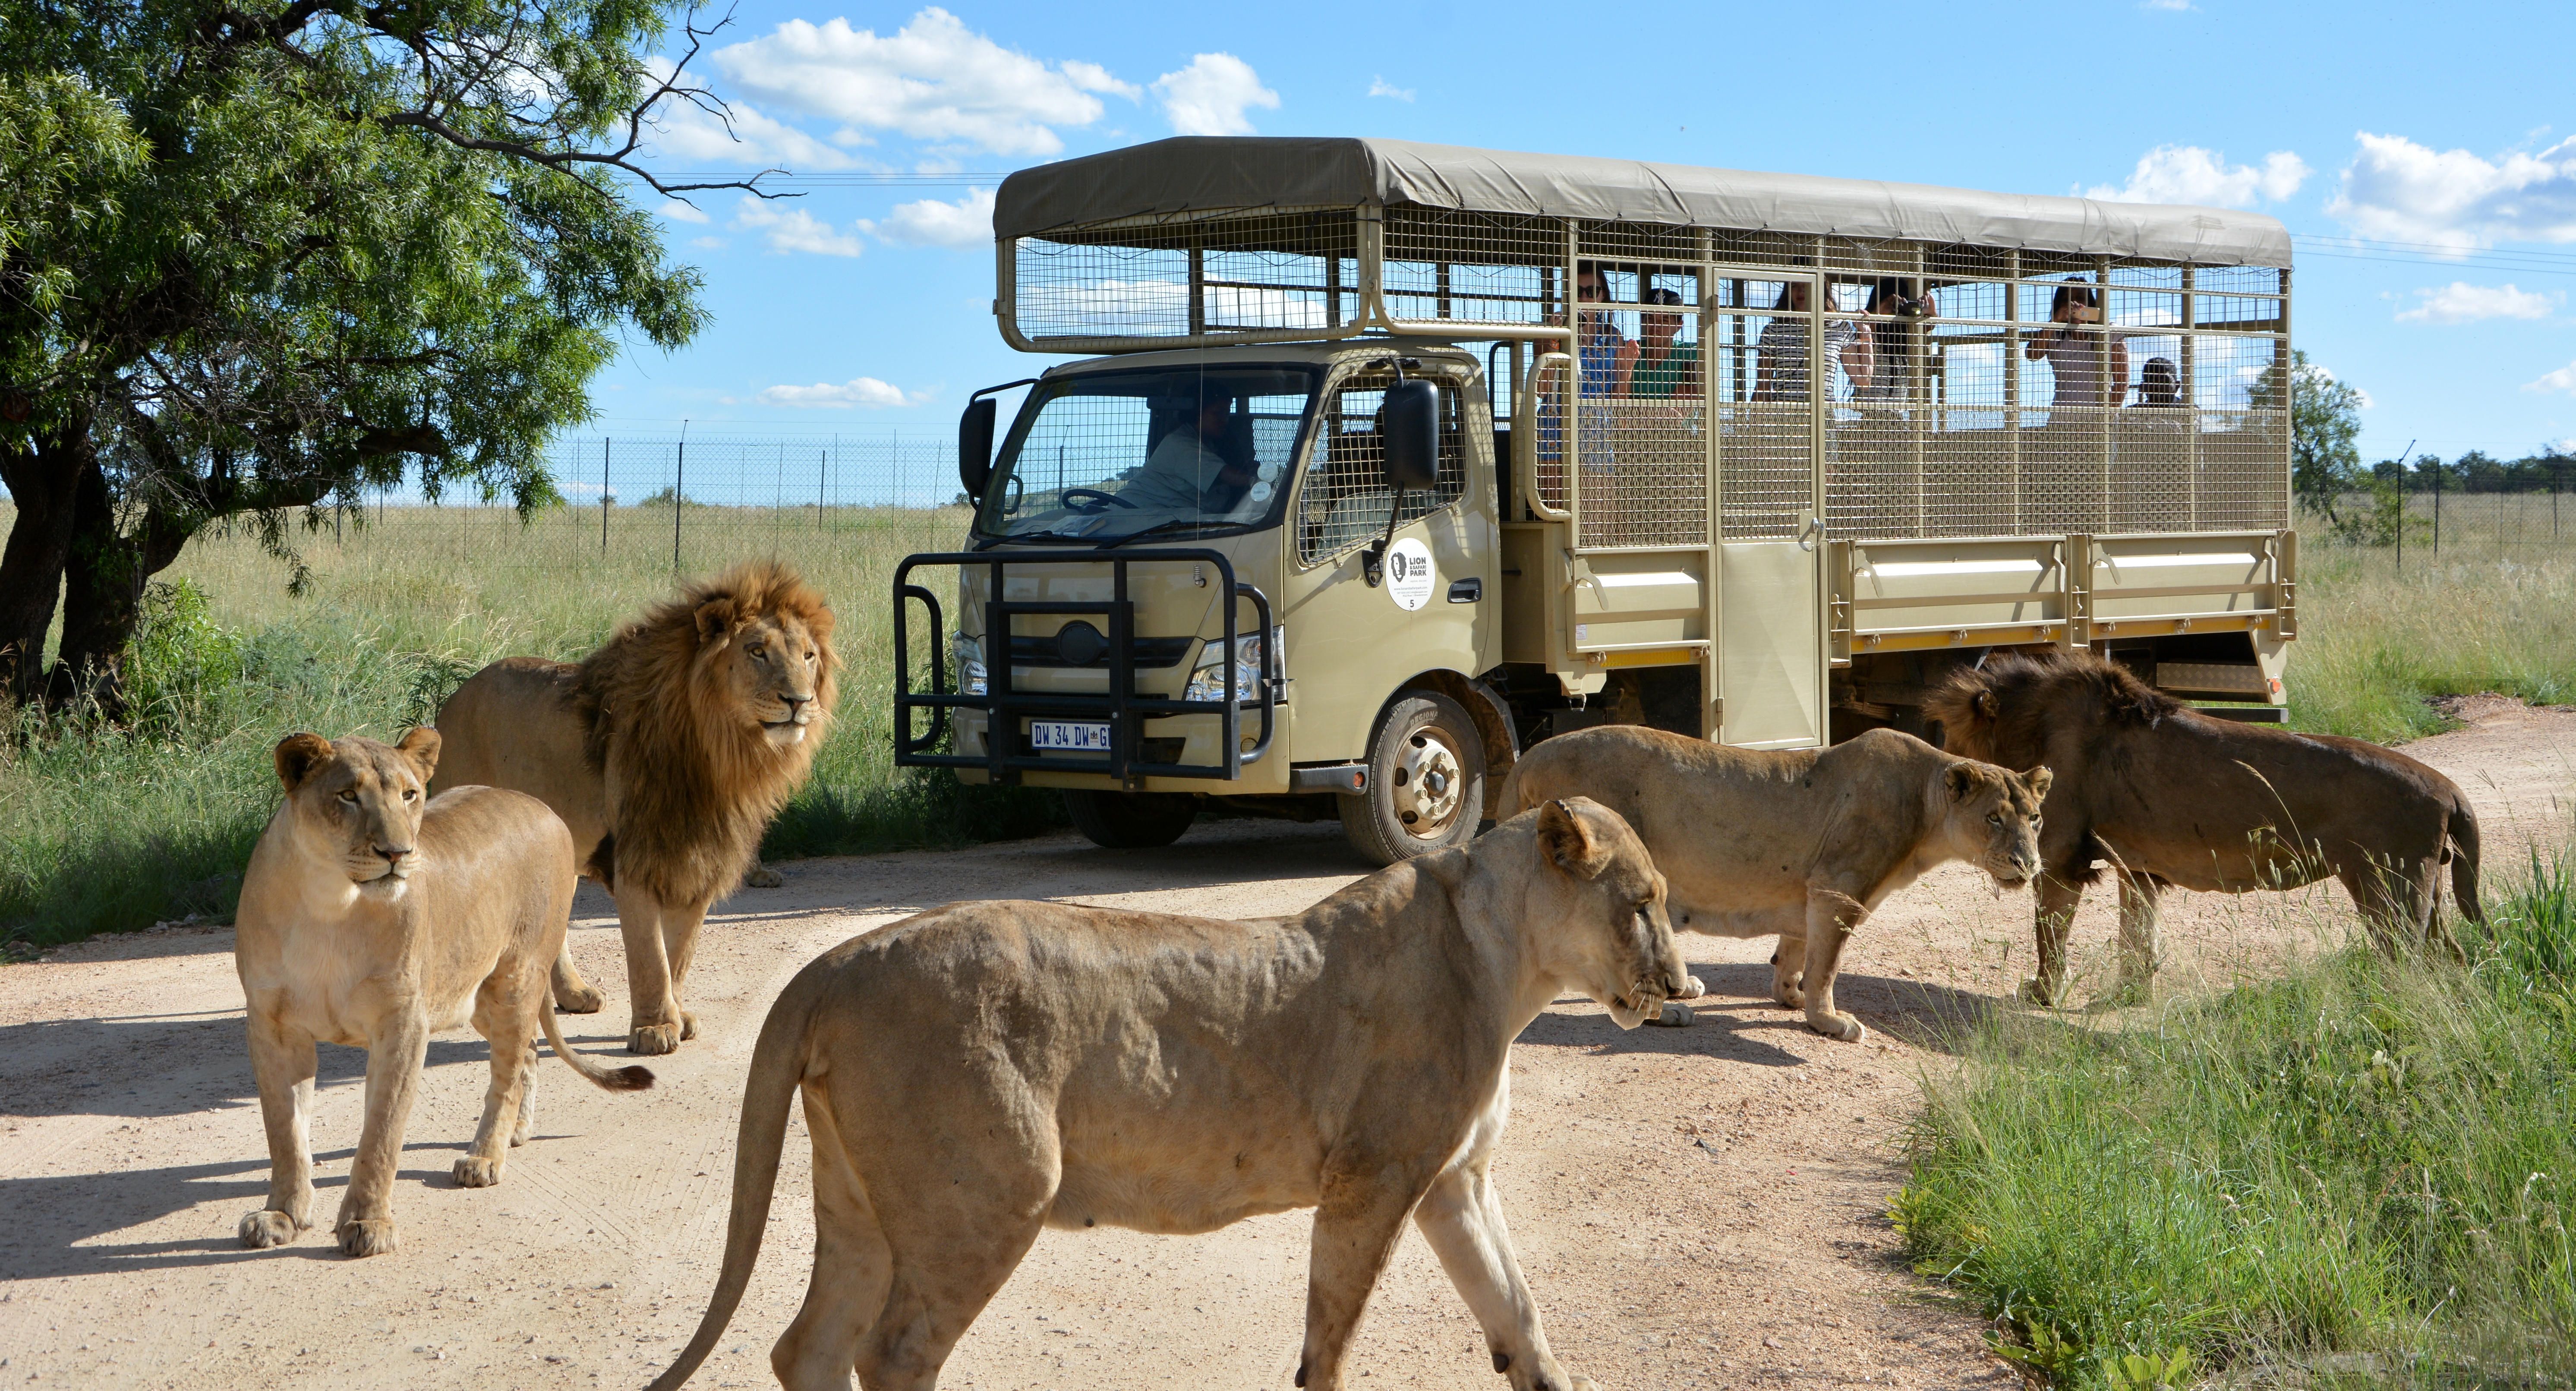 Lions at SA lion & safari park